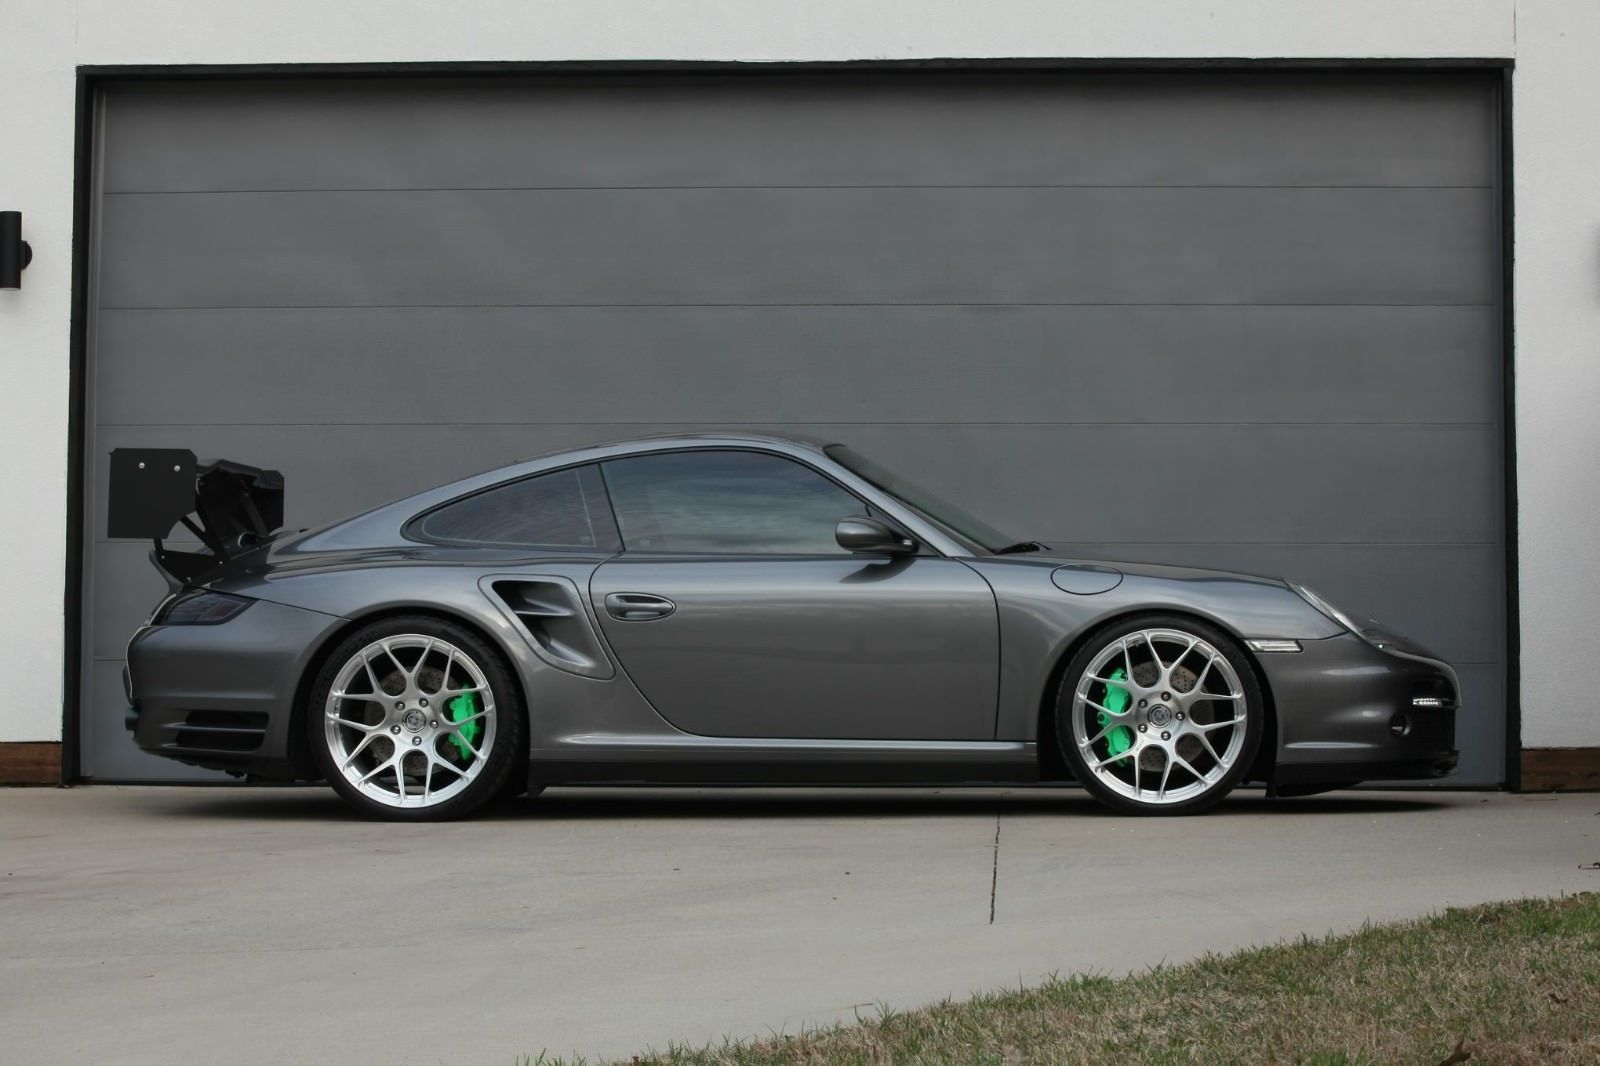 Awesome 2007 Porsche 911 Turbo 1200 Hp 997 1 Porsche Turbo 6 Speed